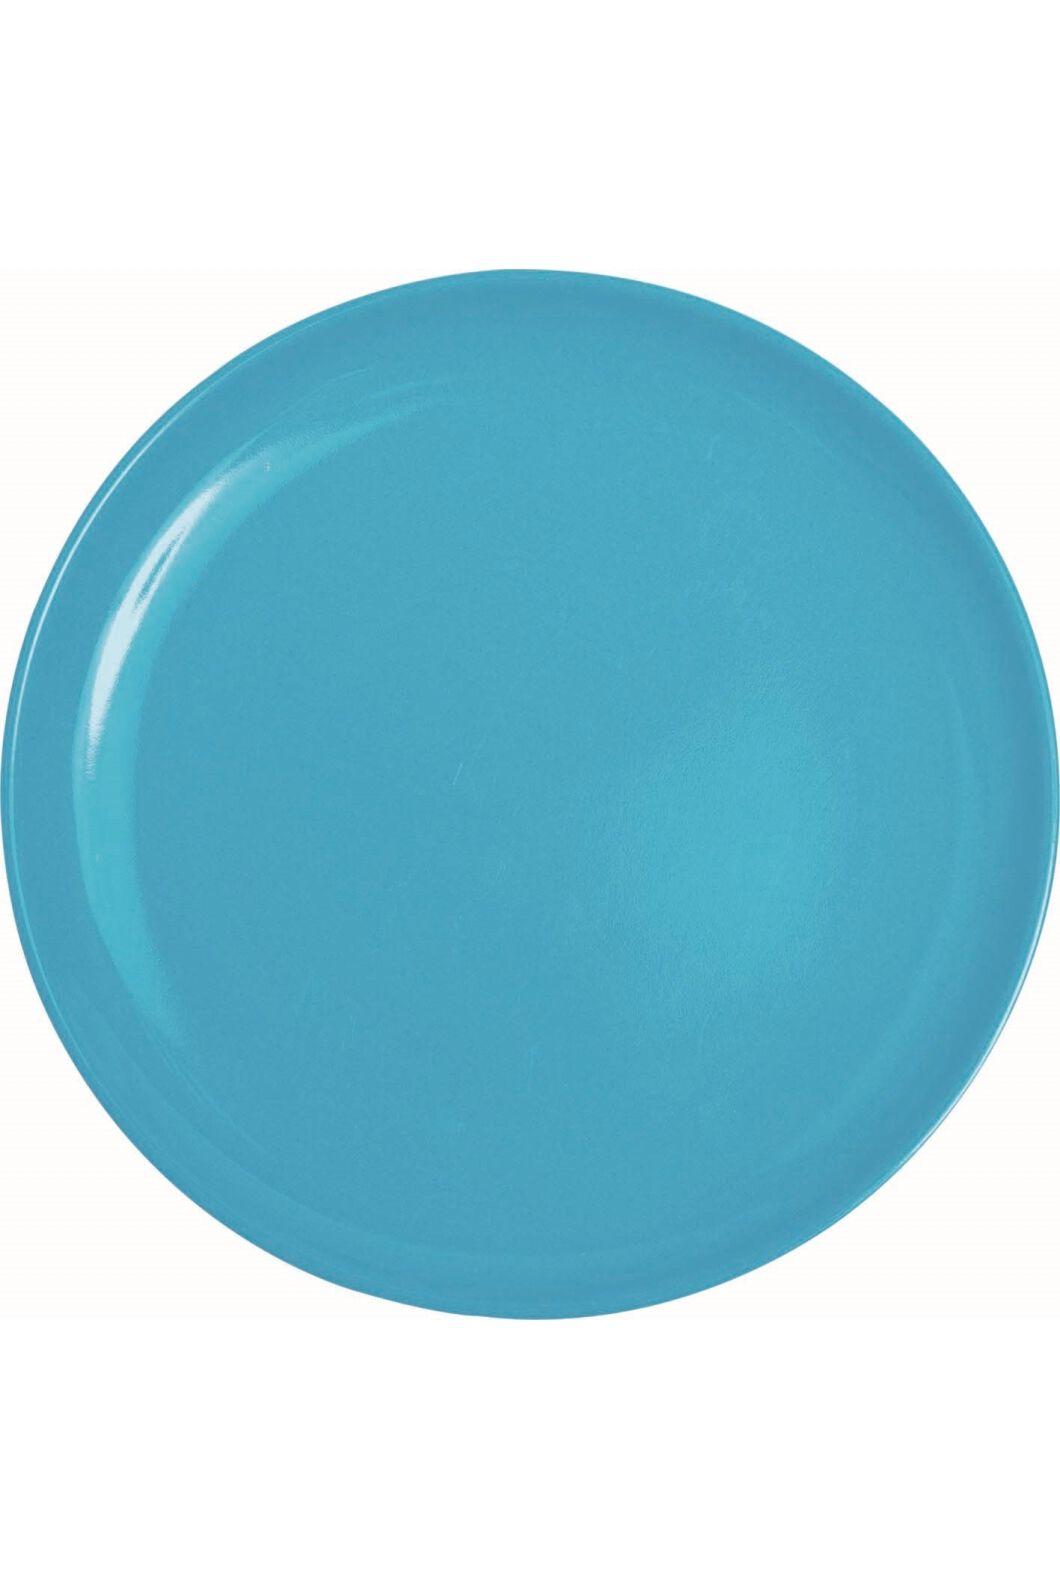 Campfire Melamine Dinner Plate, None, hi-res